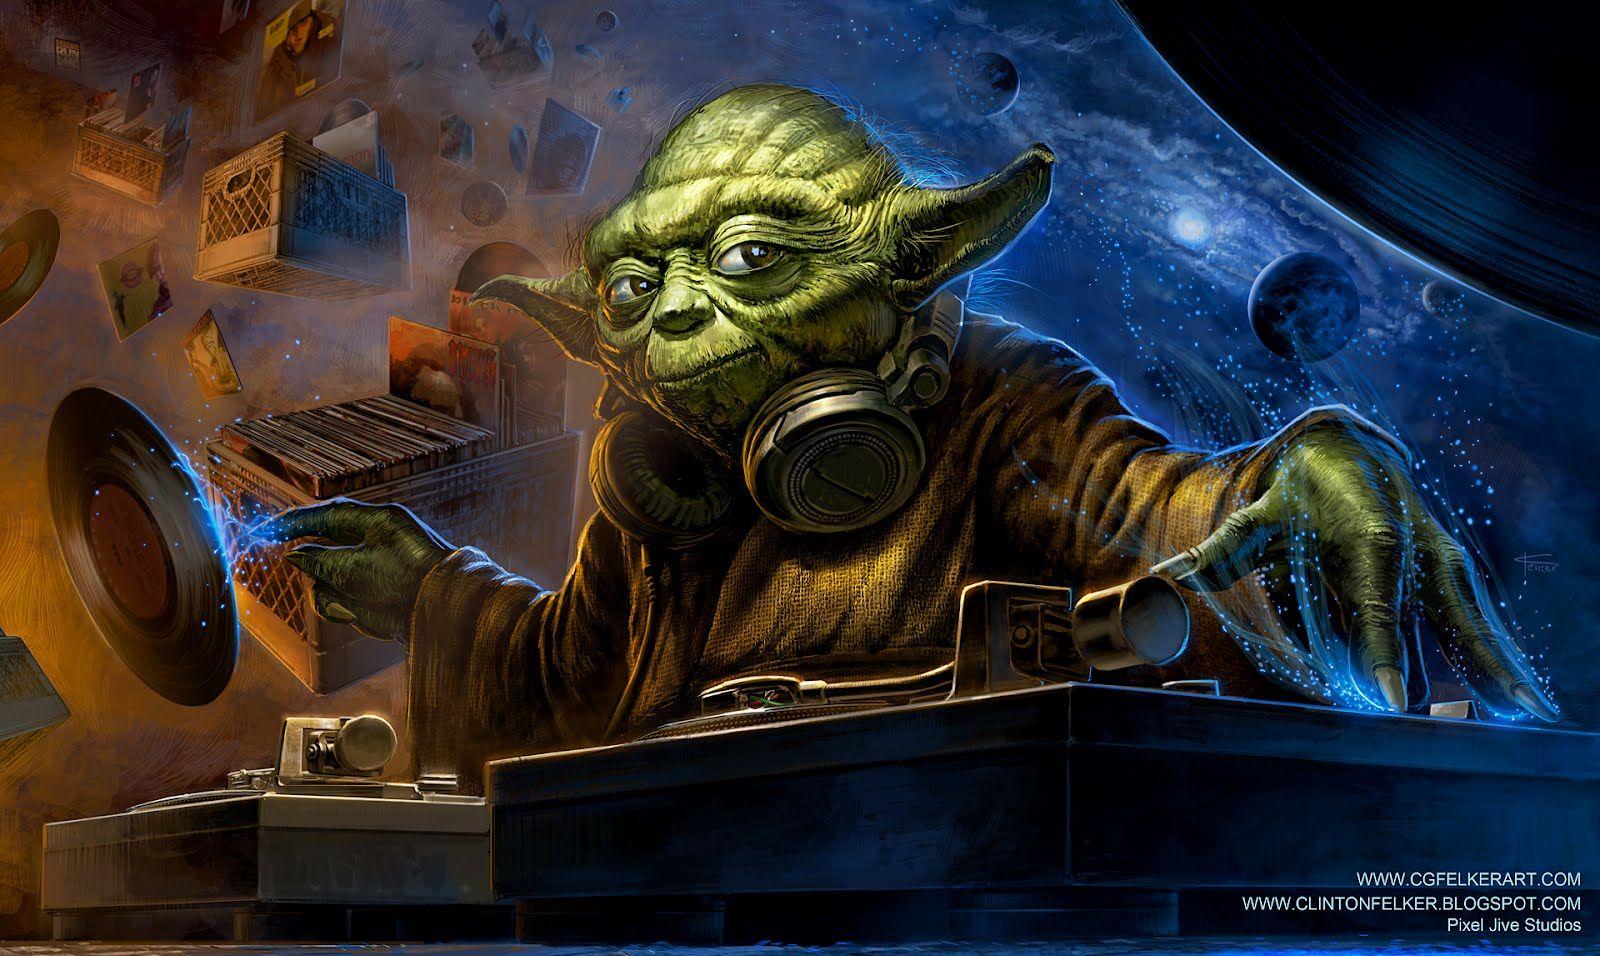 DJ Yoda | DJ/STUDIO | Star wars fan art, Star wars